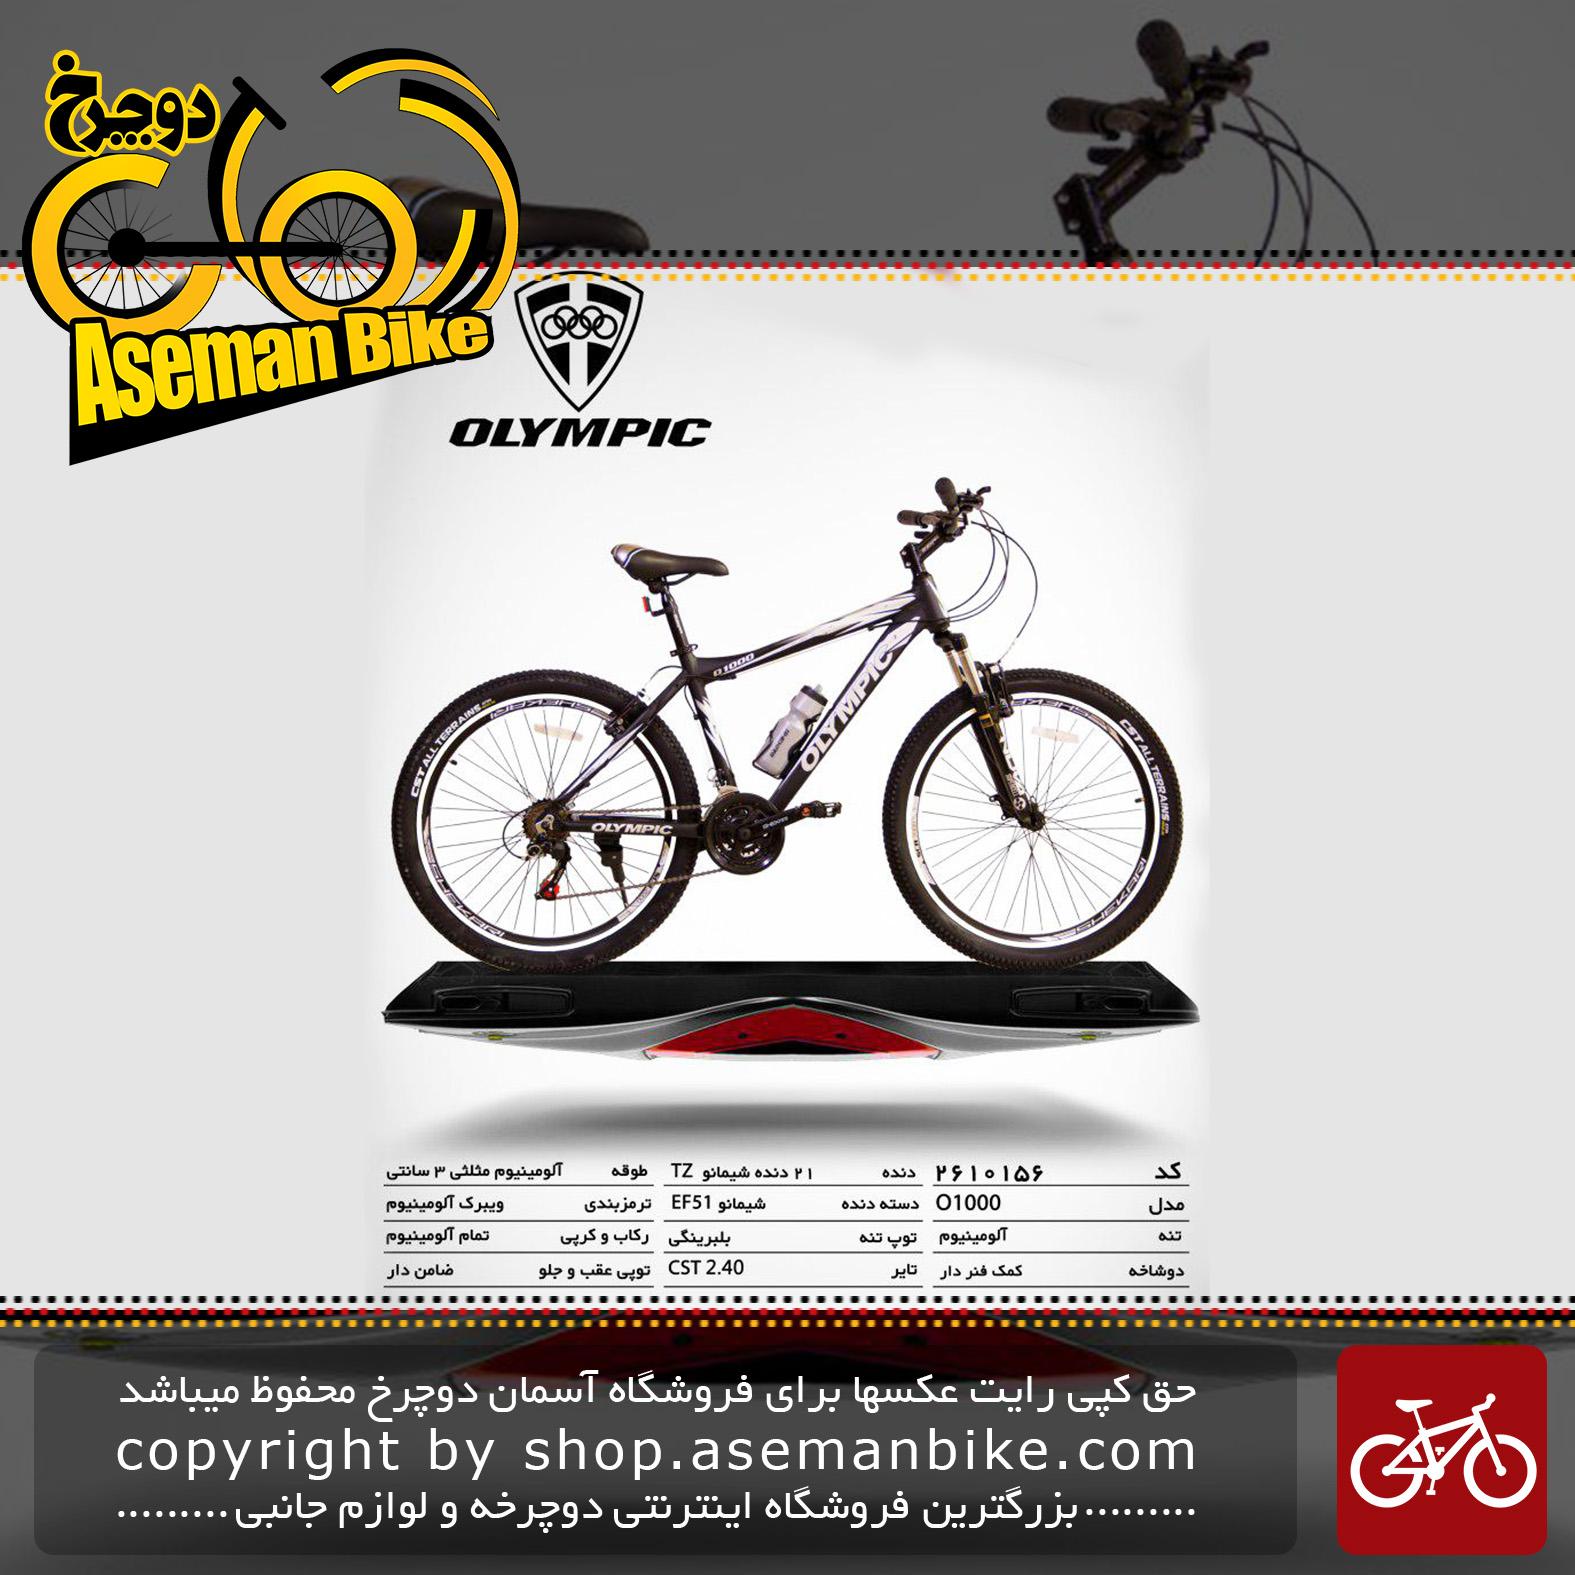 دوچرخه کوهستان شهری المپیک 21 دنده مدل او 1000 سایز 26 ساخت تایوان OLYMPIC Mountain City Bicycle Taiwan O1000 Size 26 2019